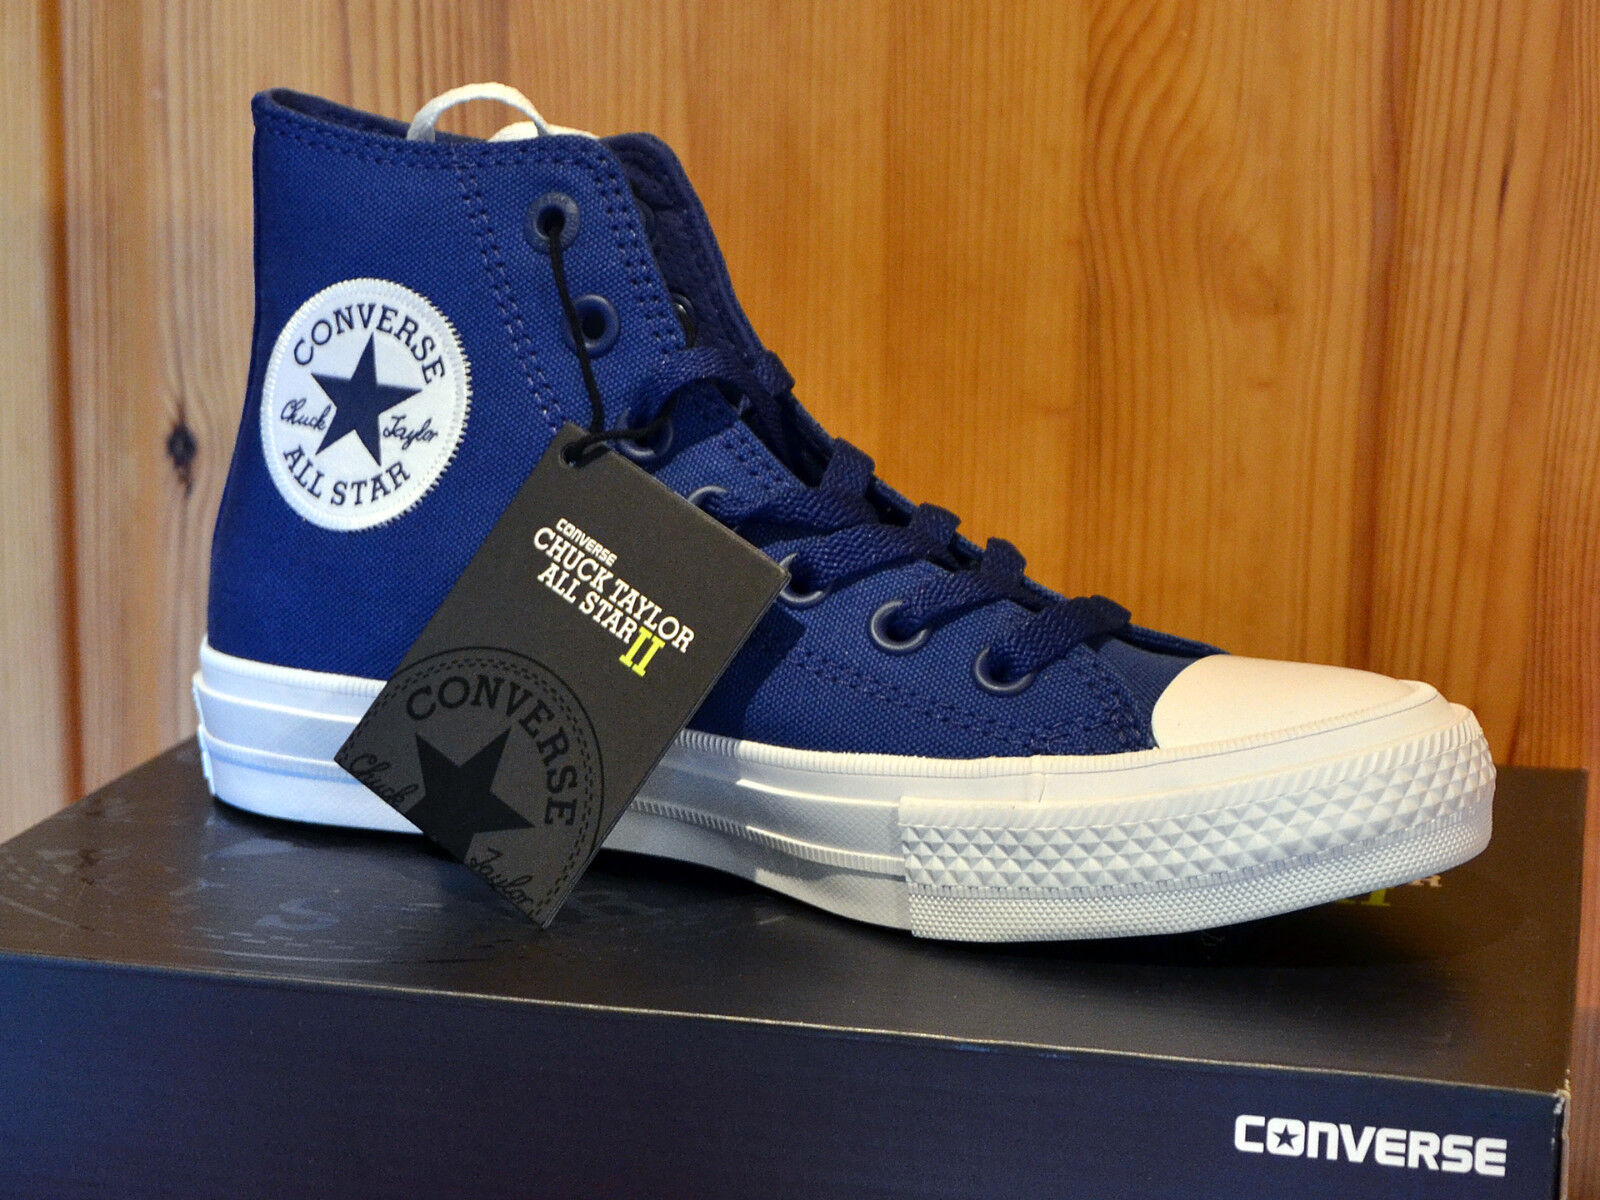 Converse Chucks Taylor All Star II Hi - EU 37 - sodalite Blau blau 150146C NEU